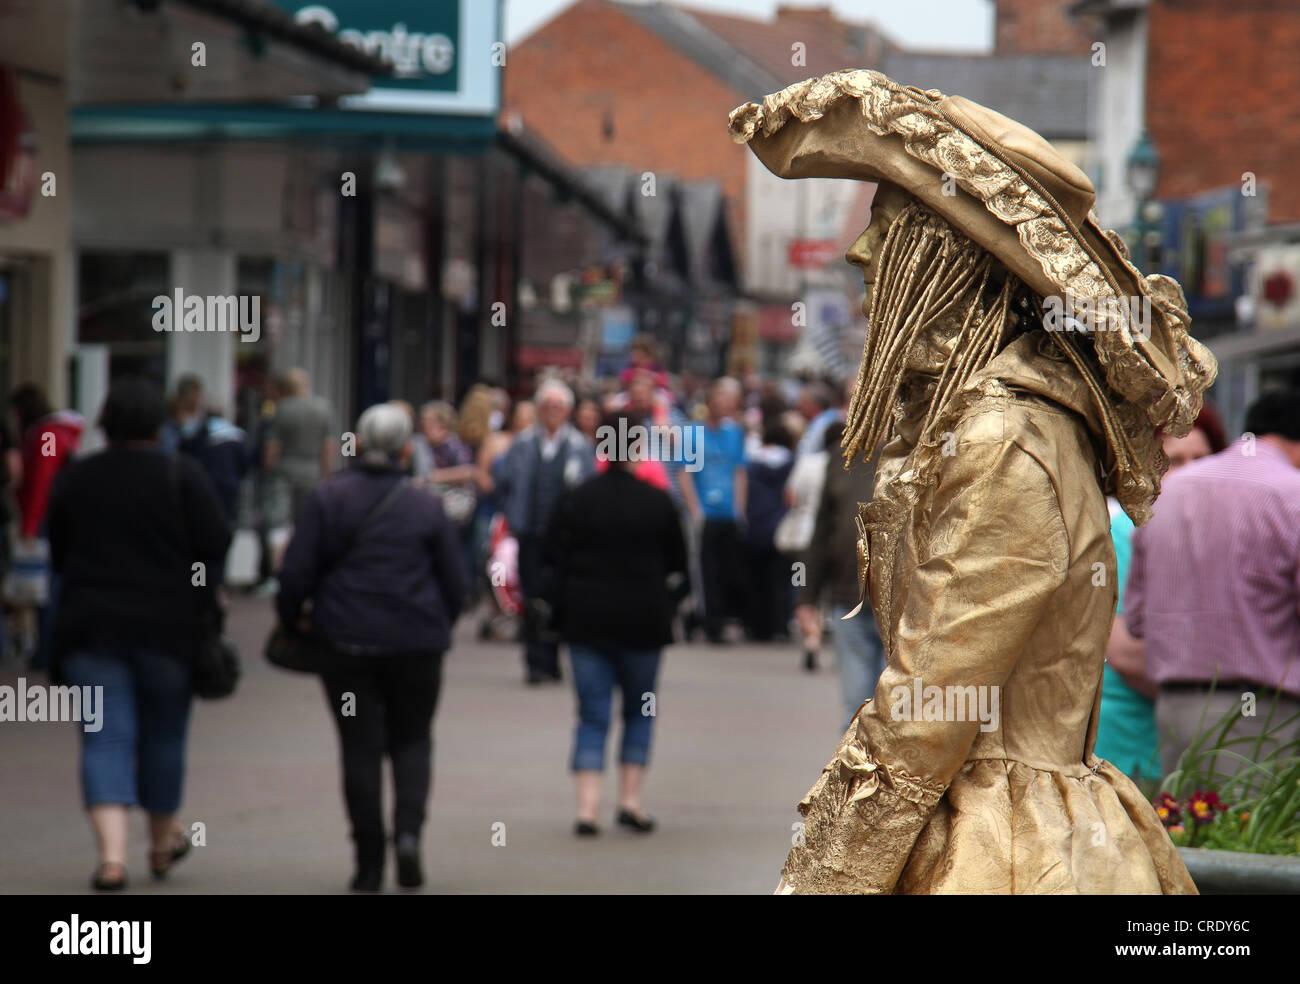 Street statue mime artist. - Stock Image